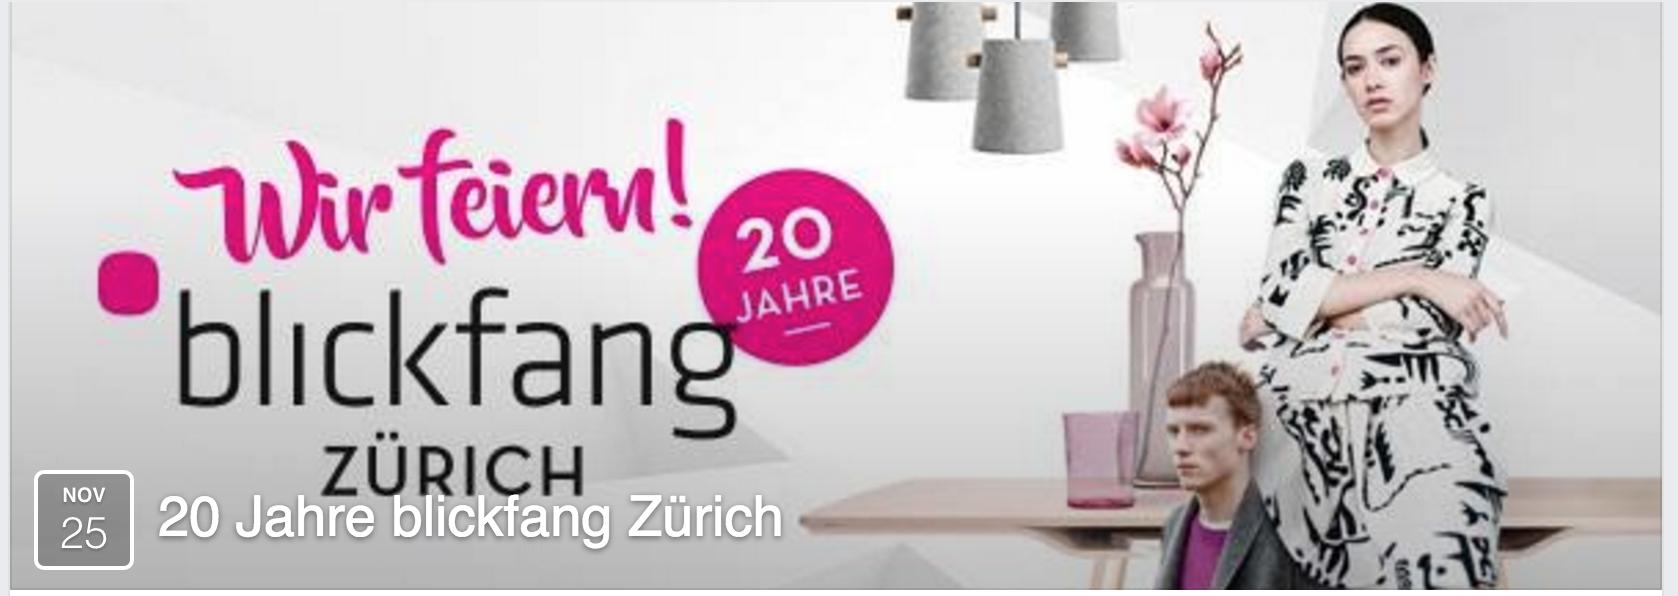 http://www.blickfang.com/en/internationale-designmesse/zurich.html